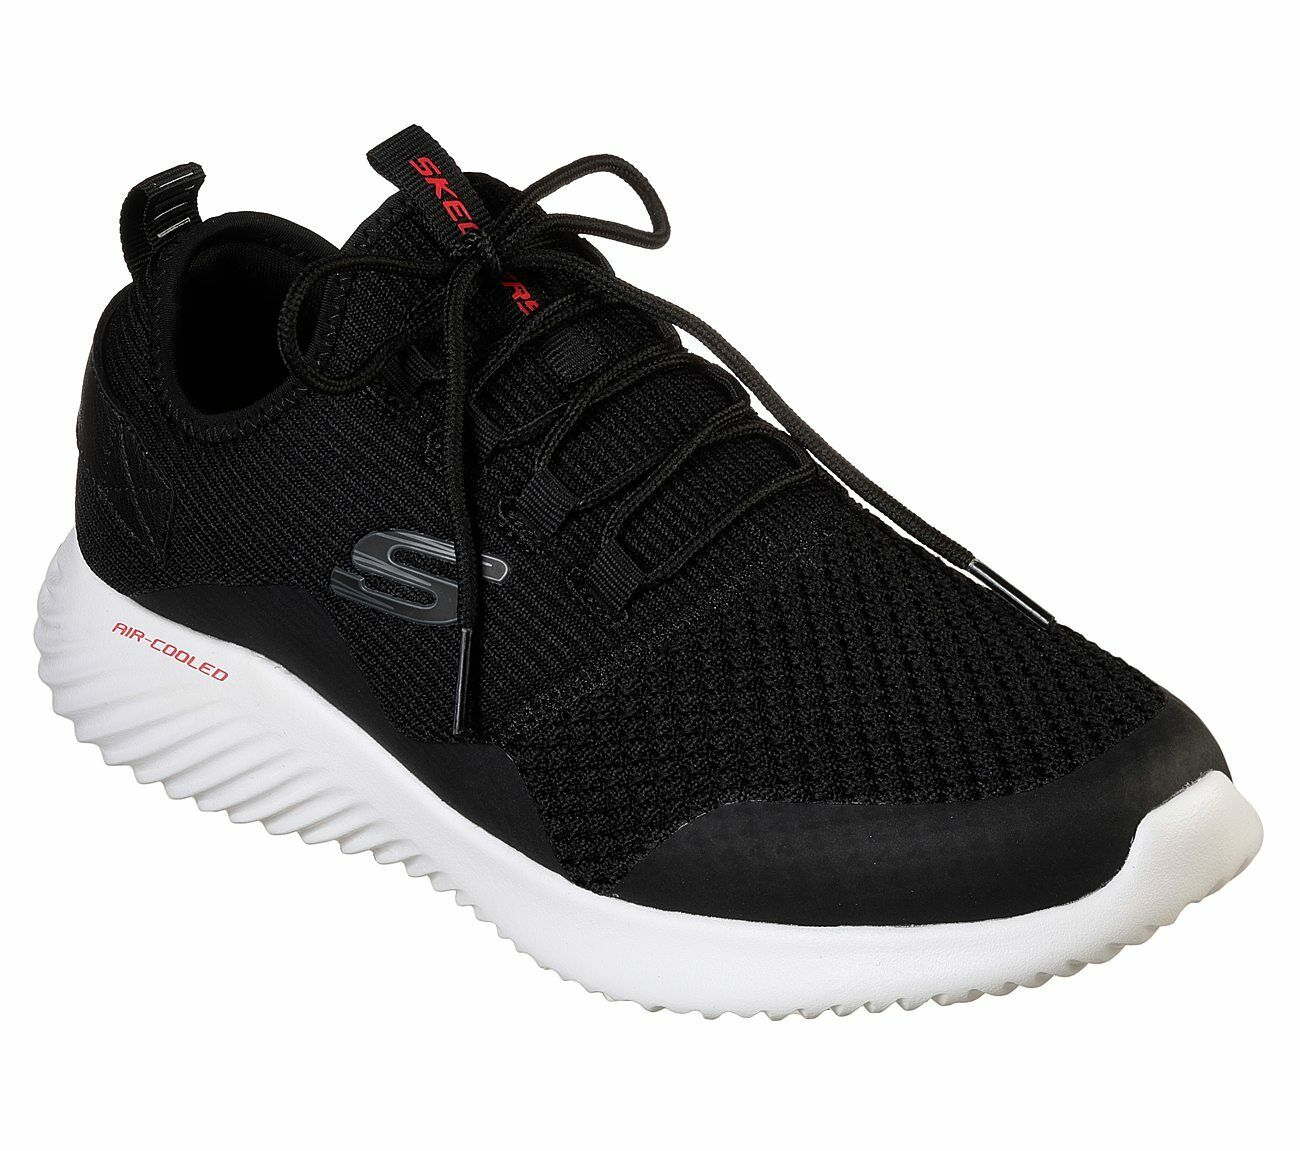 Skechers negro Zapatos Hombre Sport Casual de confort de espuma de memoria tren Caminar Malla 52510